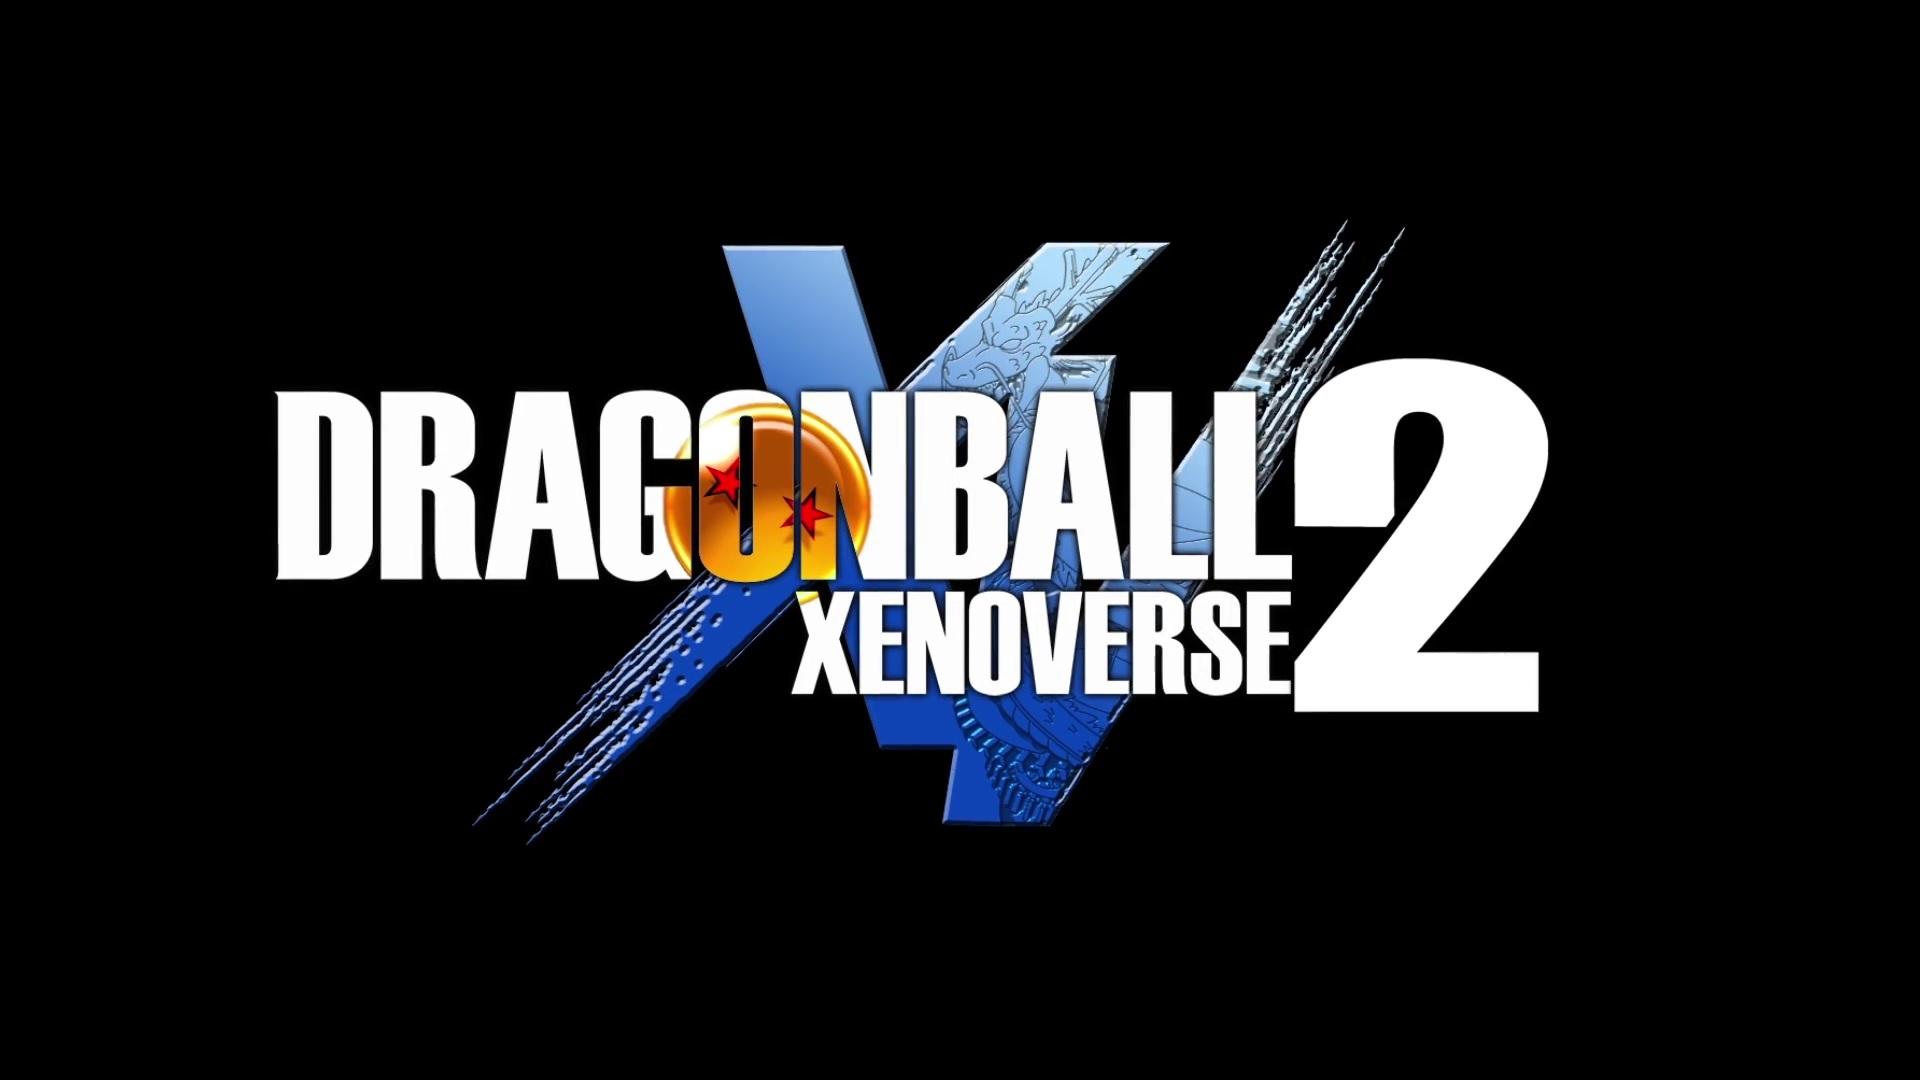 Dragon Ball Xenoverse 2 wallpaper 7 1920x1080